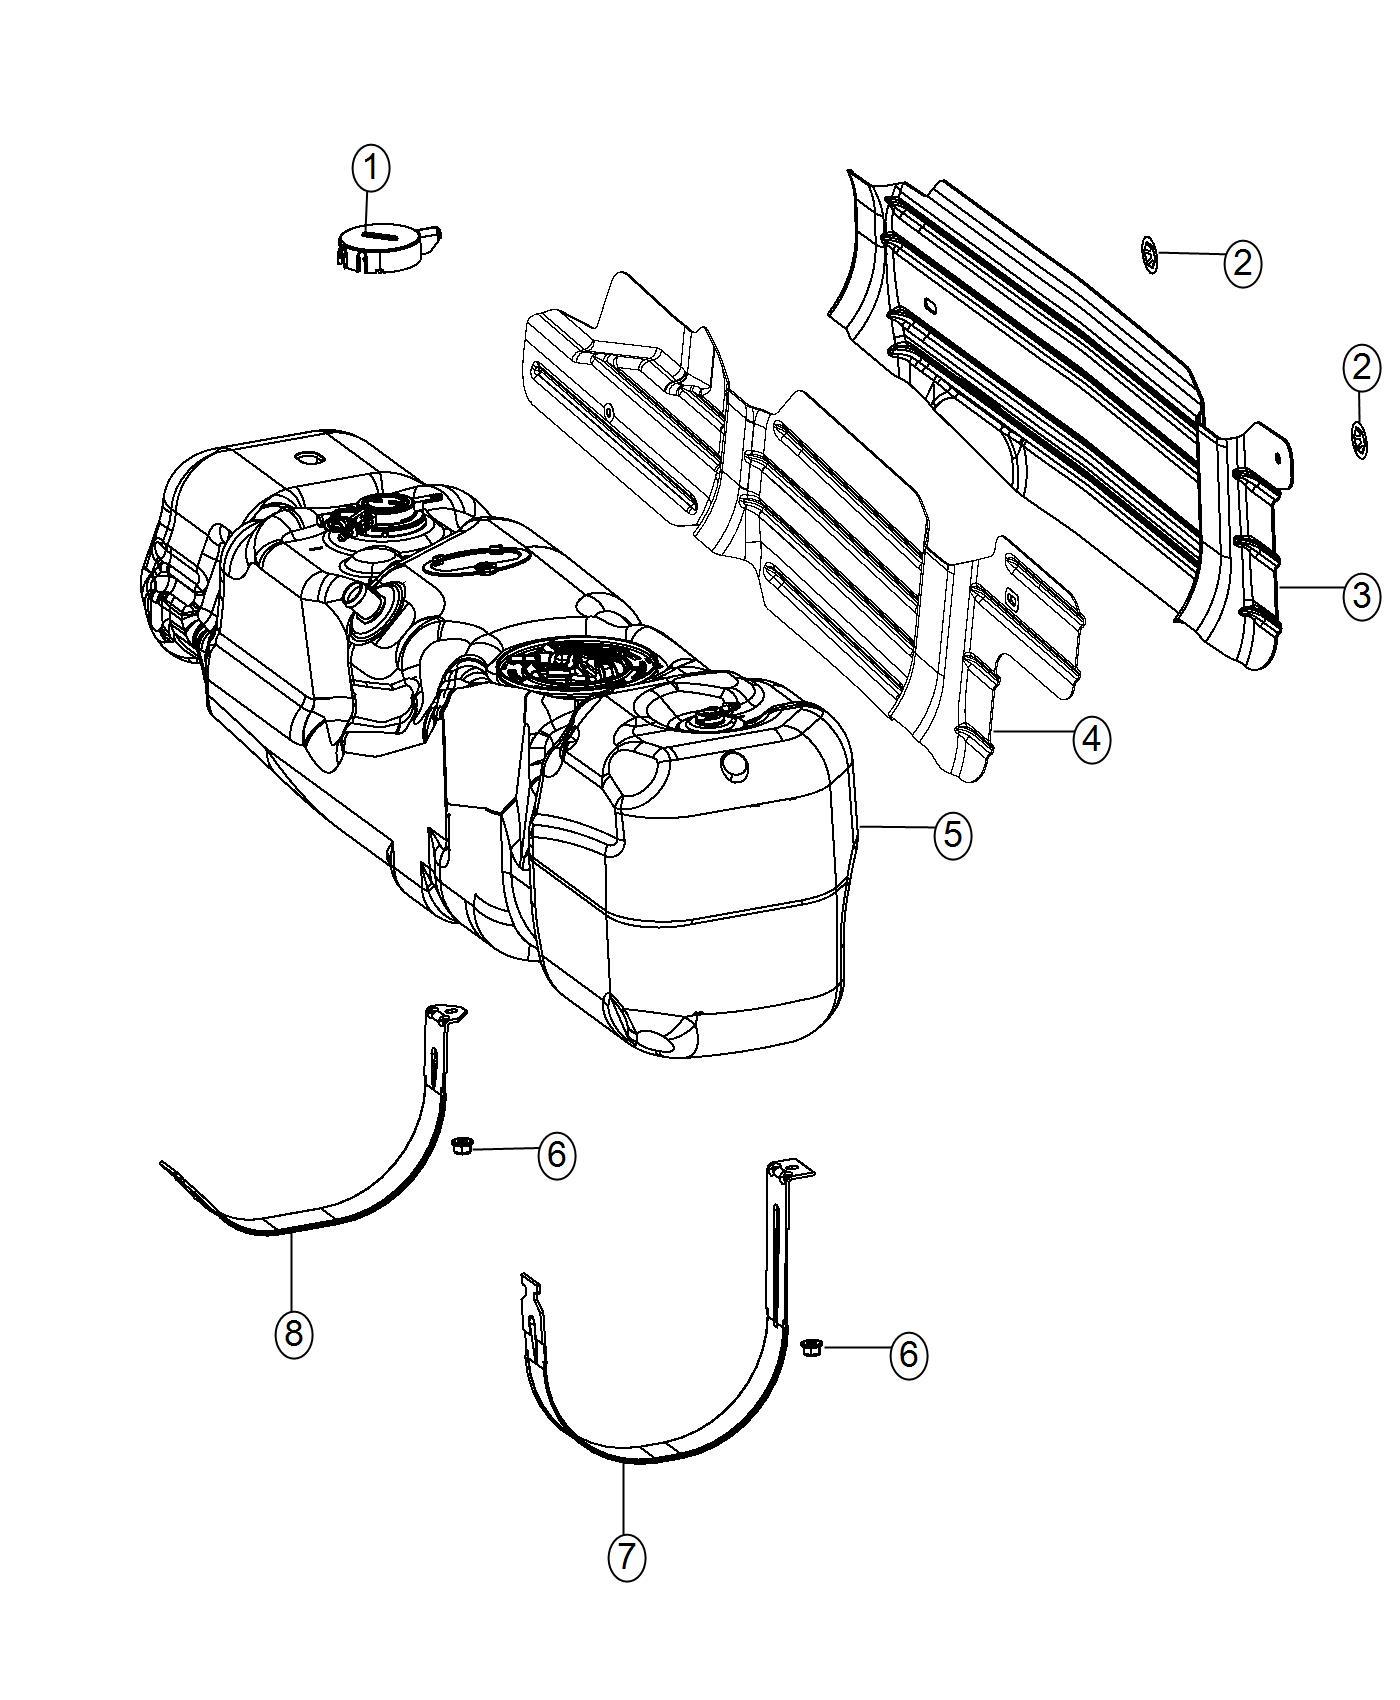 Ram Shield Fuel Tank Heat 32 Gallon Fuel Tank